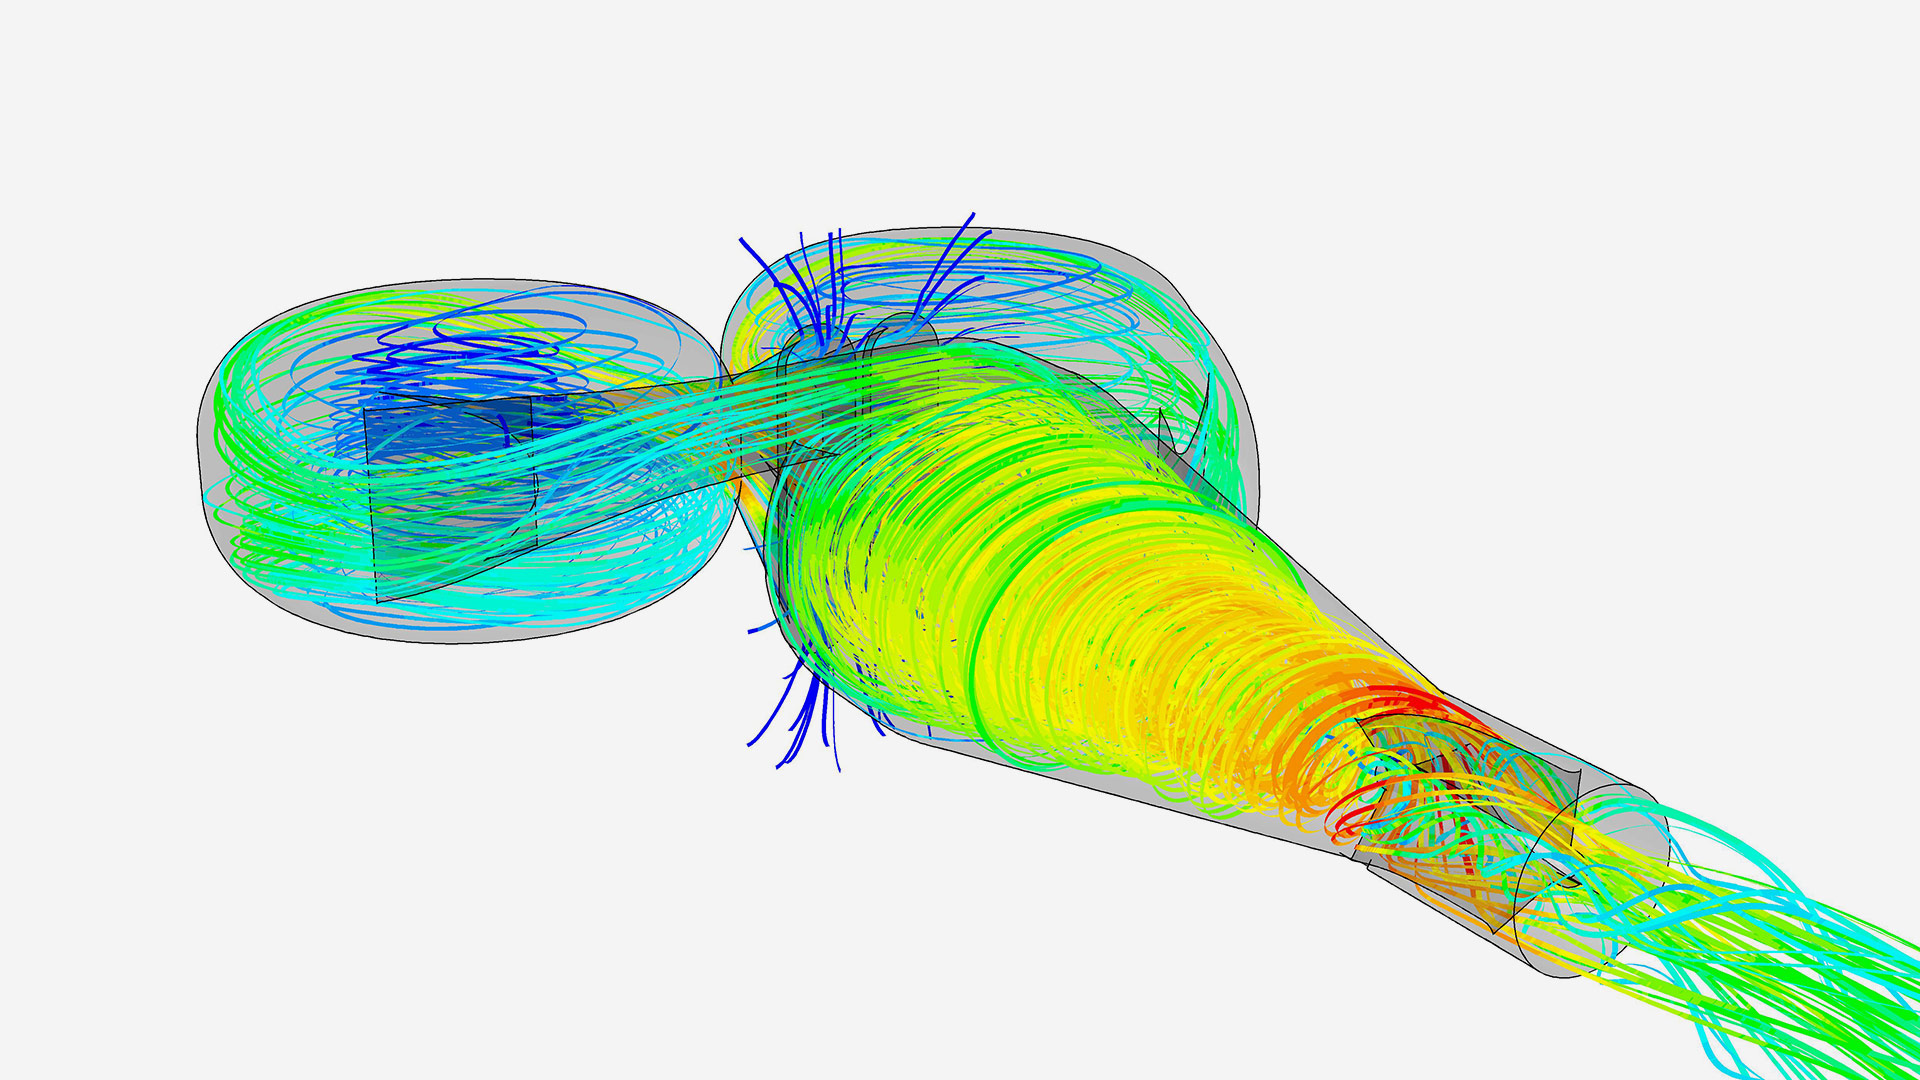 Airflow simulation testing using CFD